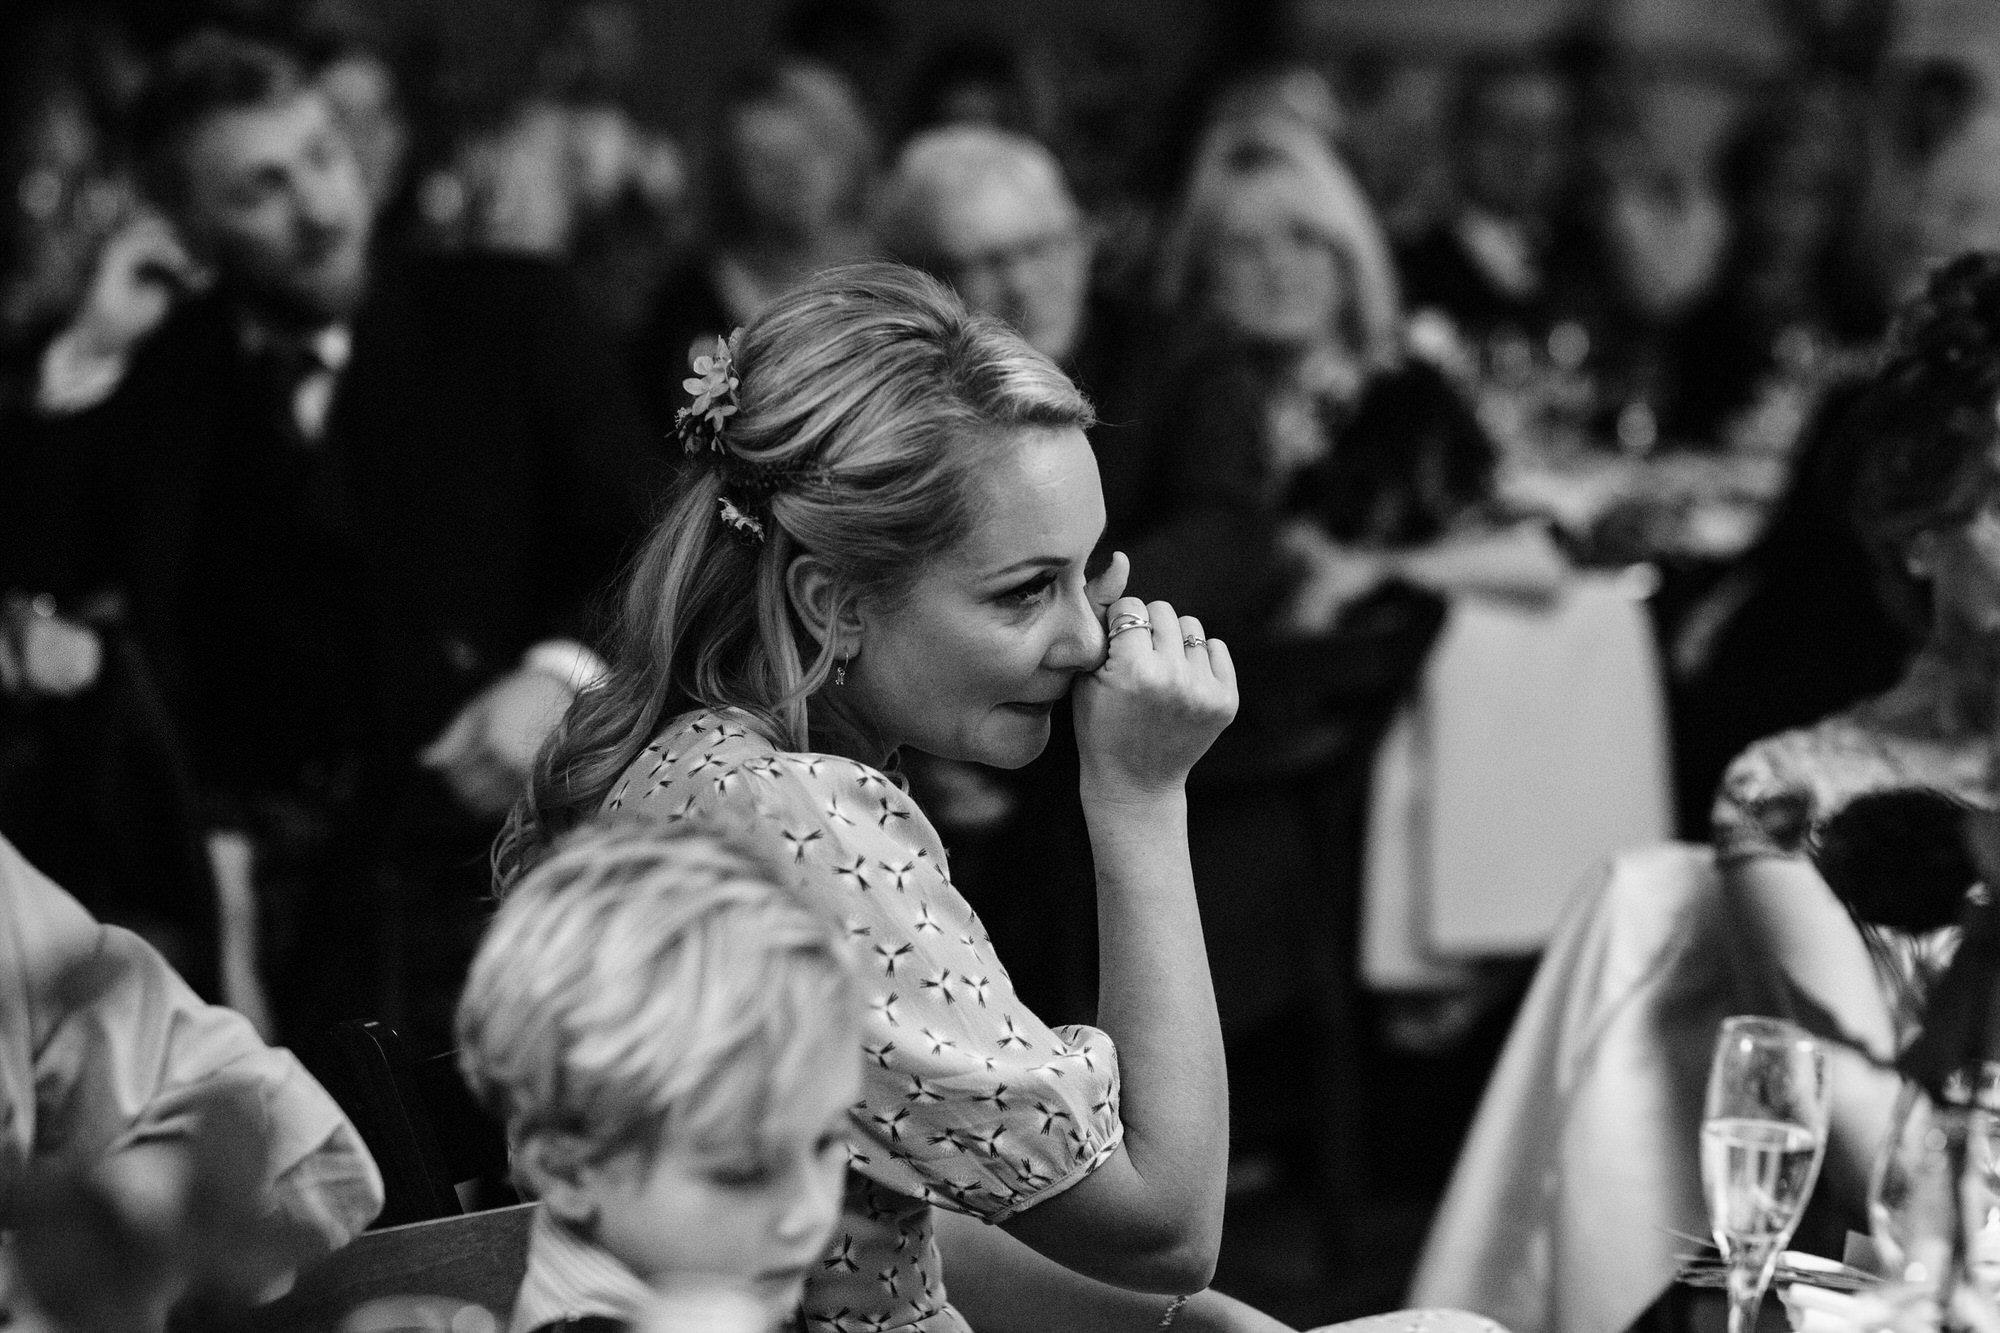 053 TIN SHED KNOCKRAICH WEDDING AUTUMN ZOE ALEXANDRA PHOTOGRAPHY